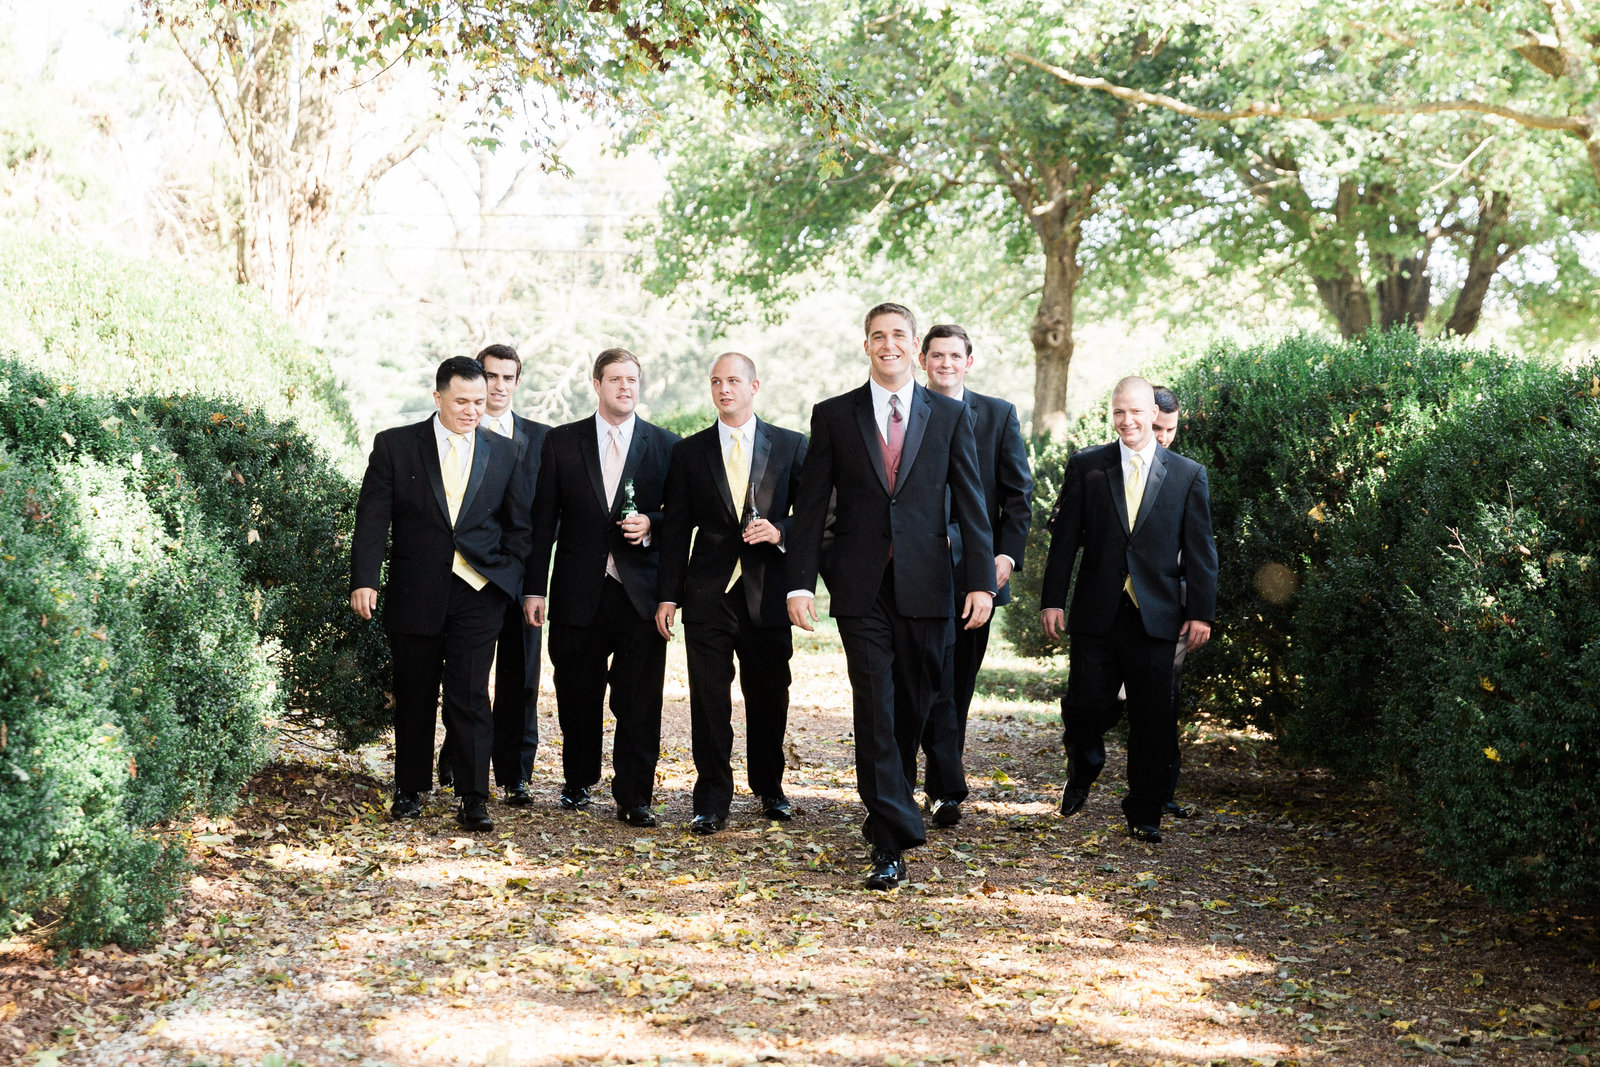 Corcoran_05_Bridal-Party_003